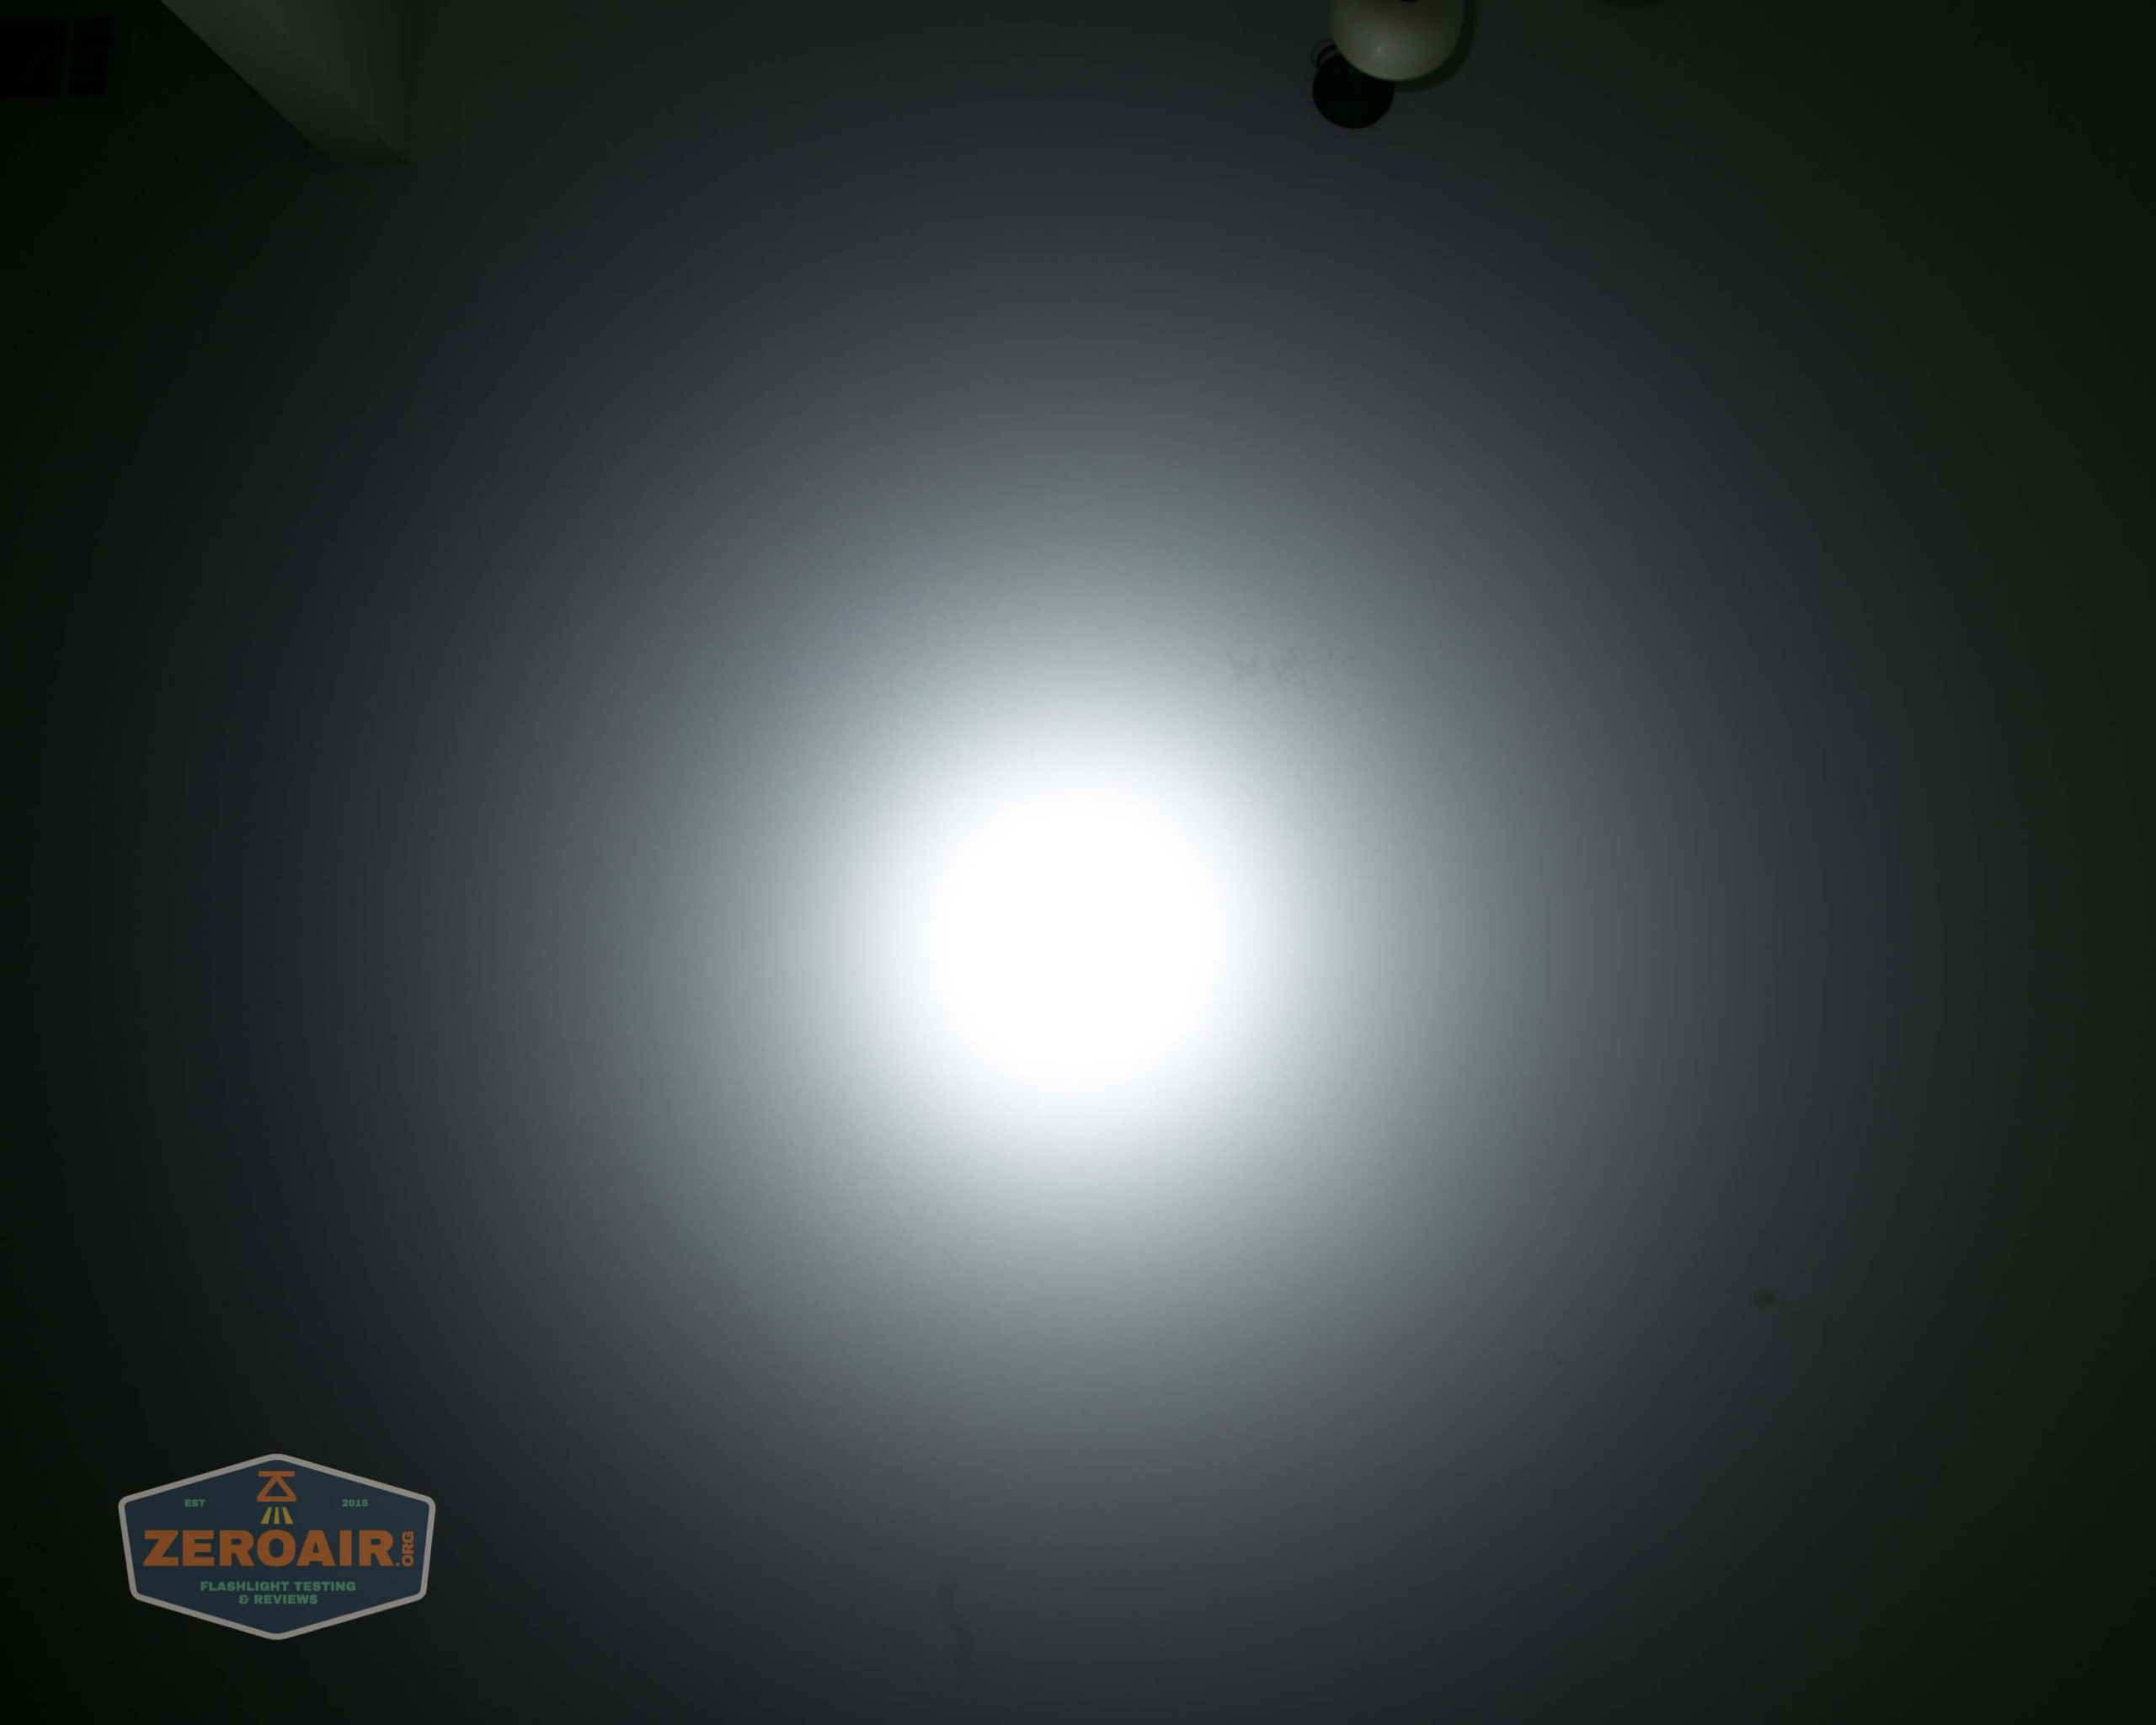 acebeam l17 osram white 18650 thrower ceiling beamshot